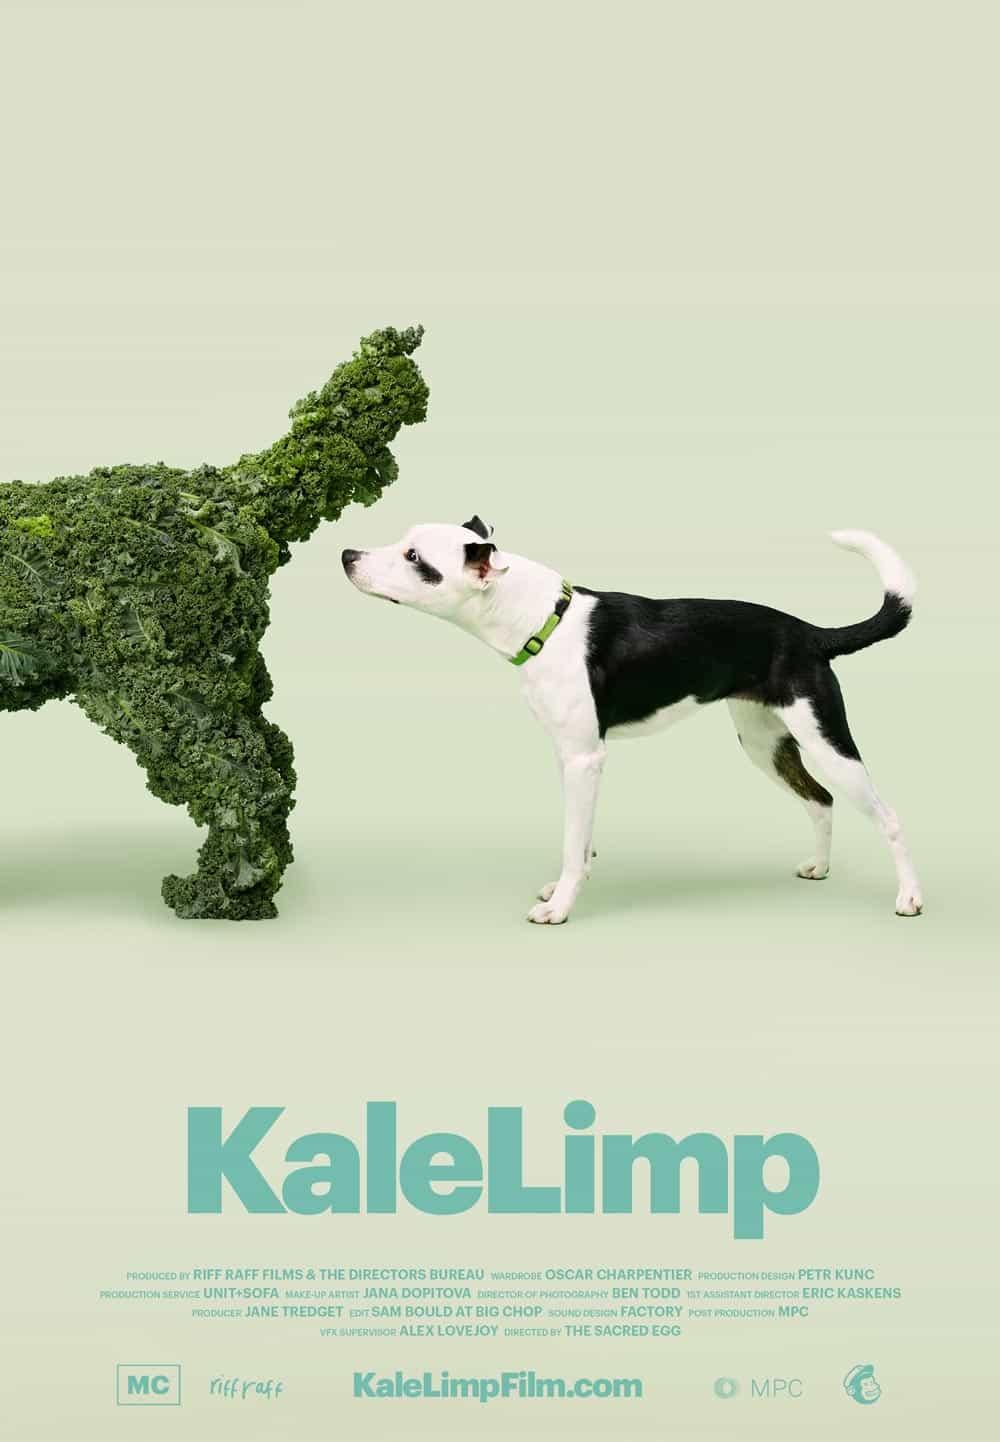 Kale limp